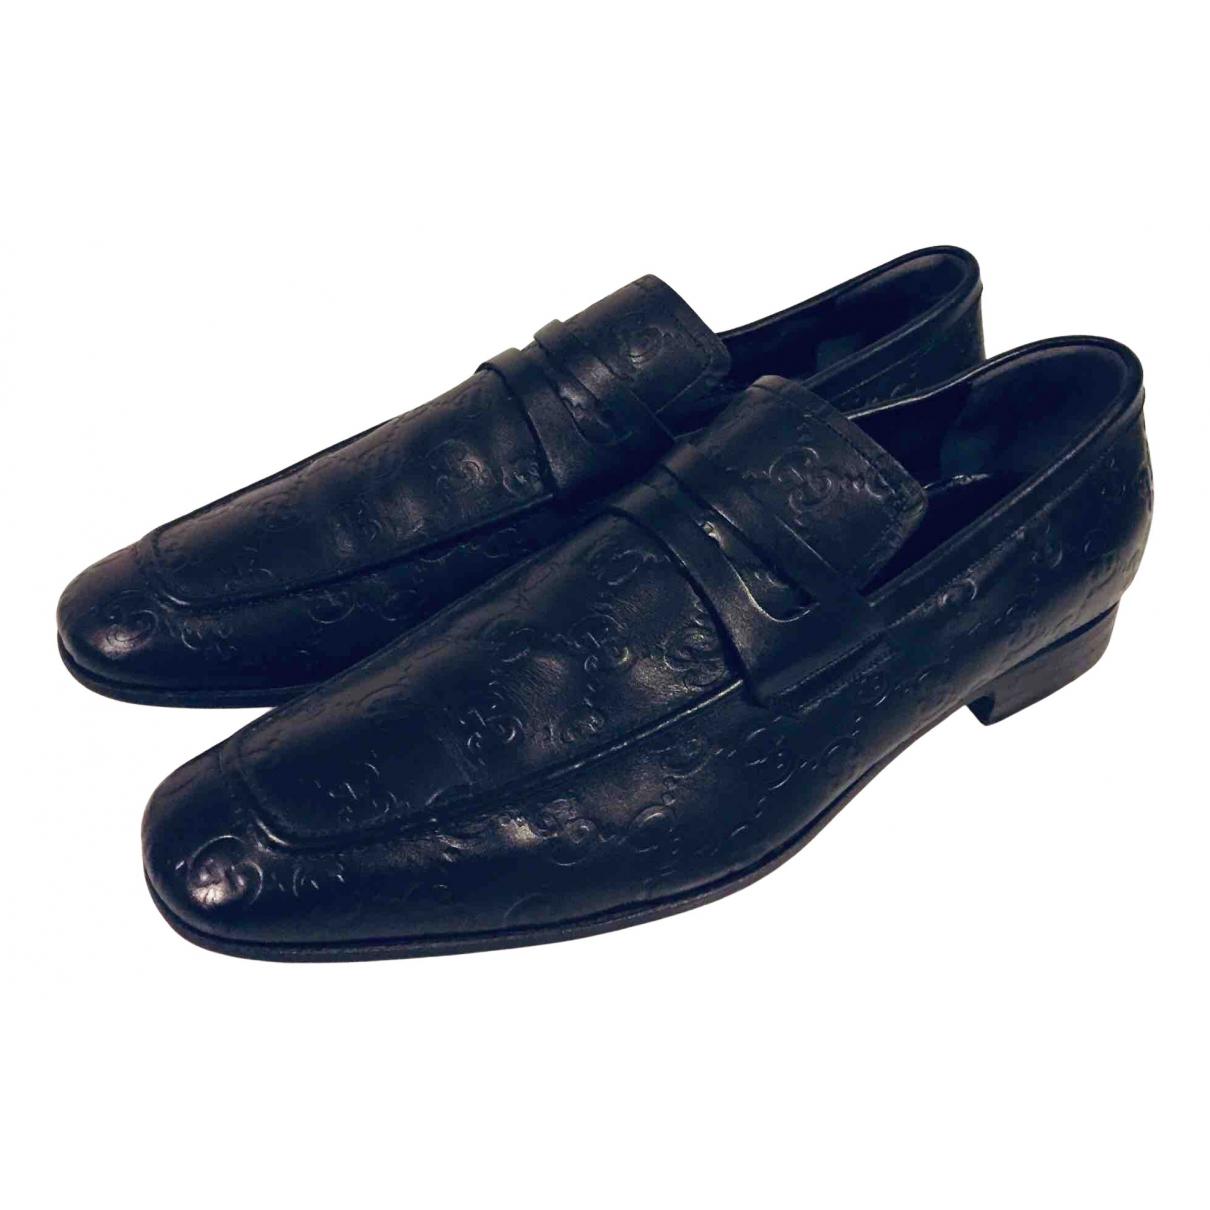 Gucci N Black Leather Flats for Men 41 EU